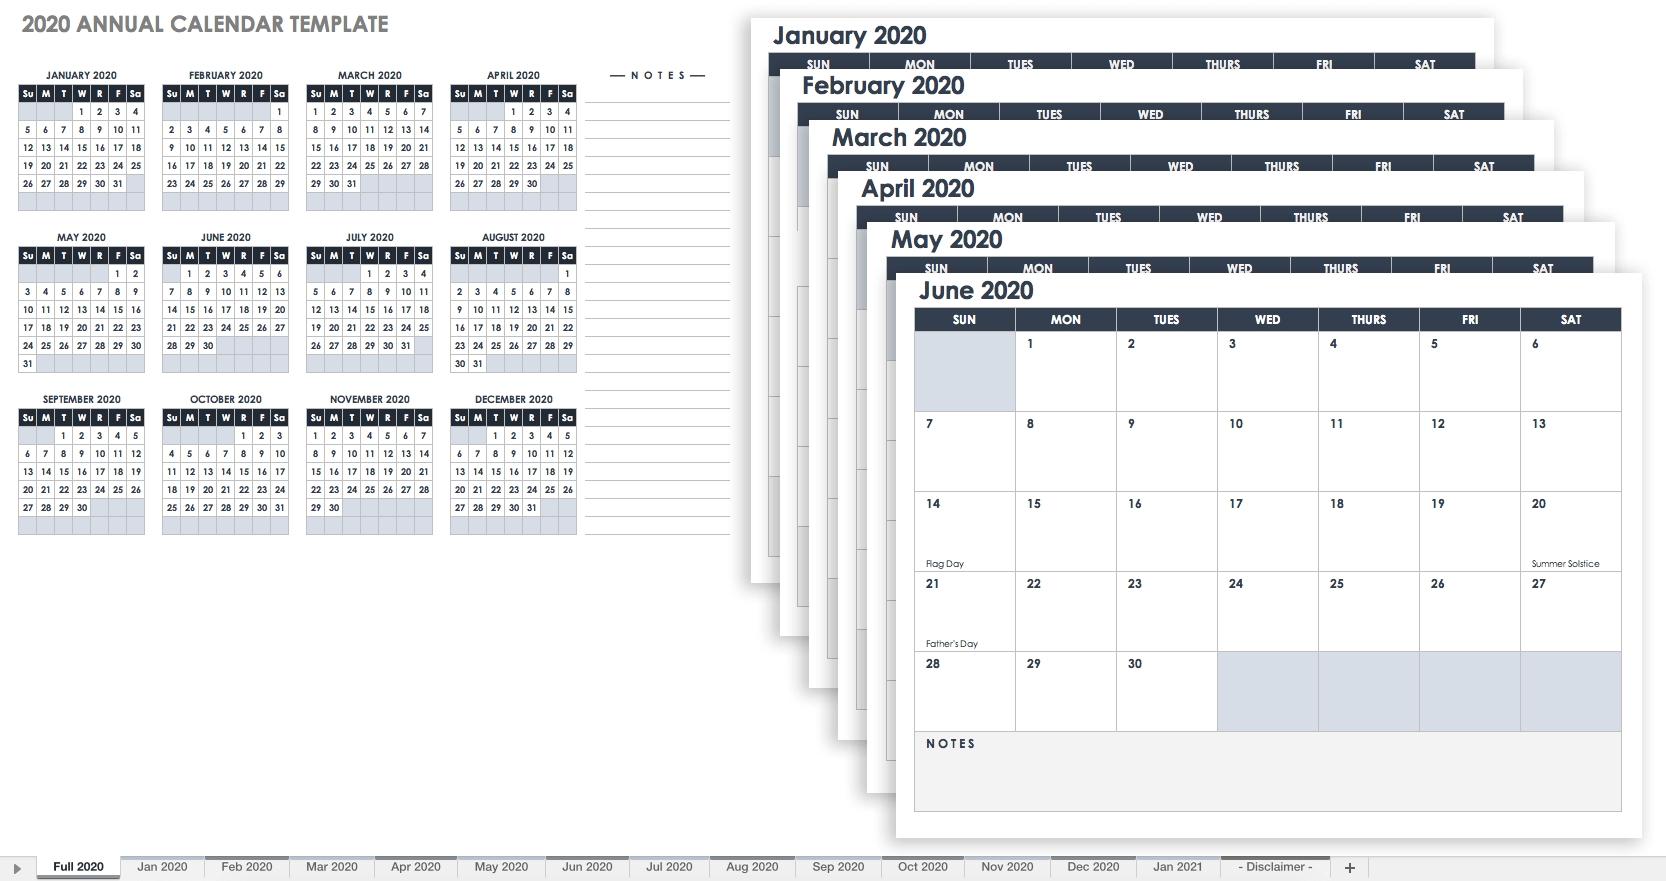 Free Blank Calendar Templates - Smartsheet-2020 Biweekly Pay Calendar Word Template